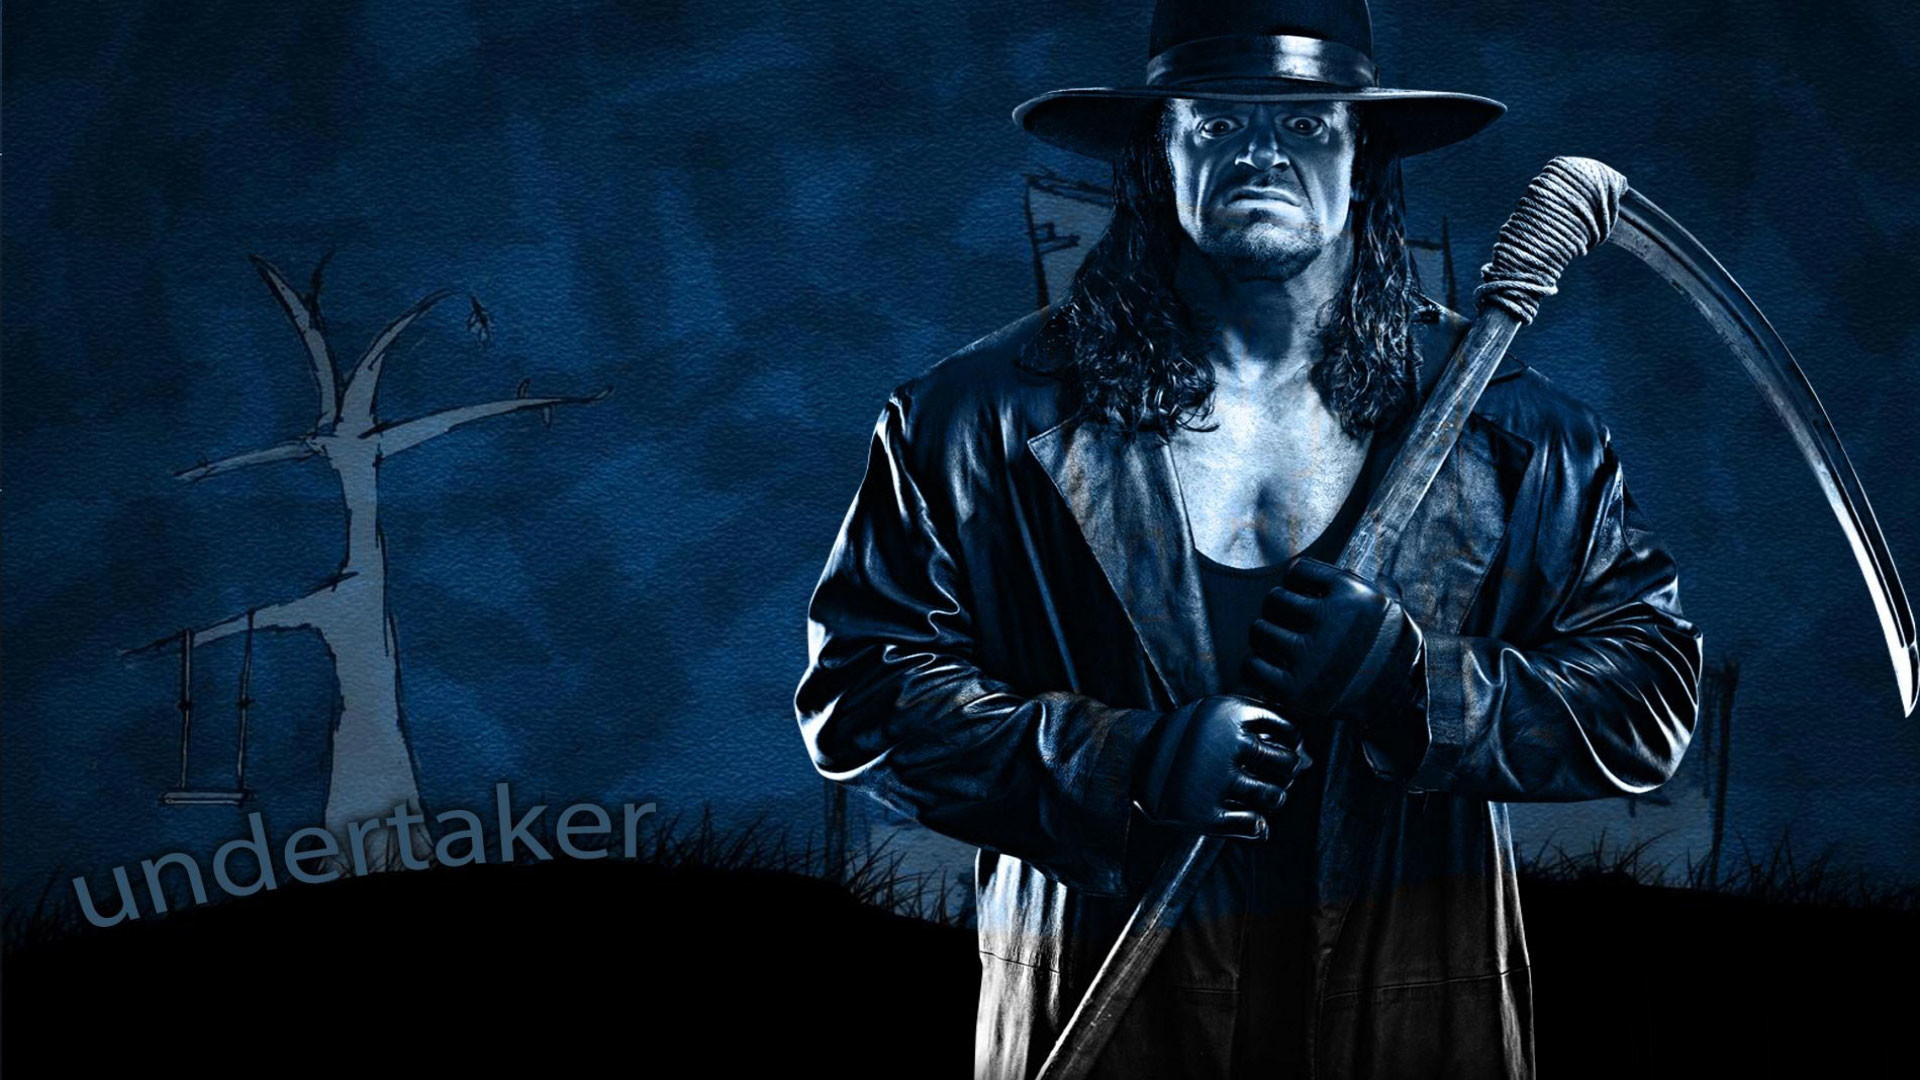 WWE Background Wallpaper ·① WallpaperTag